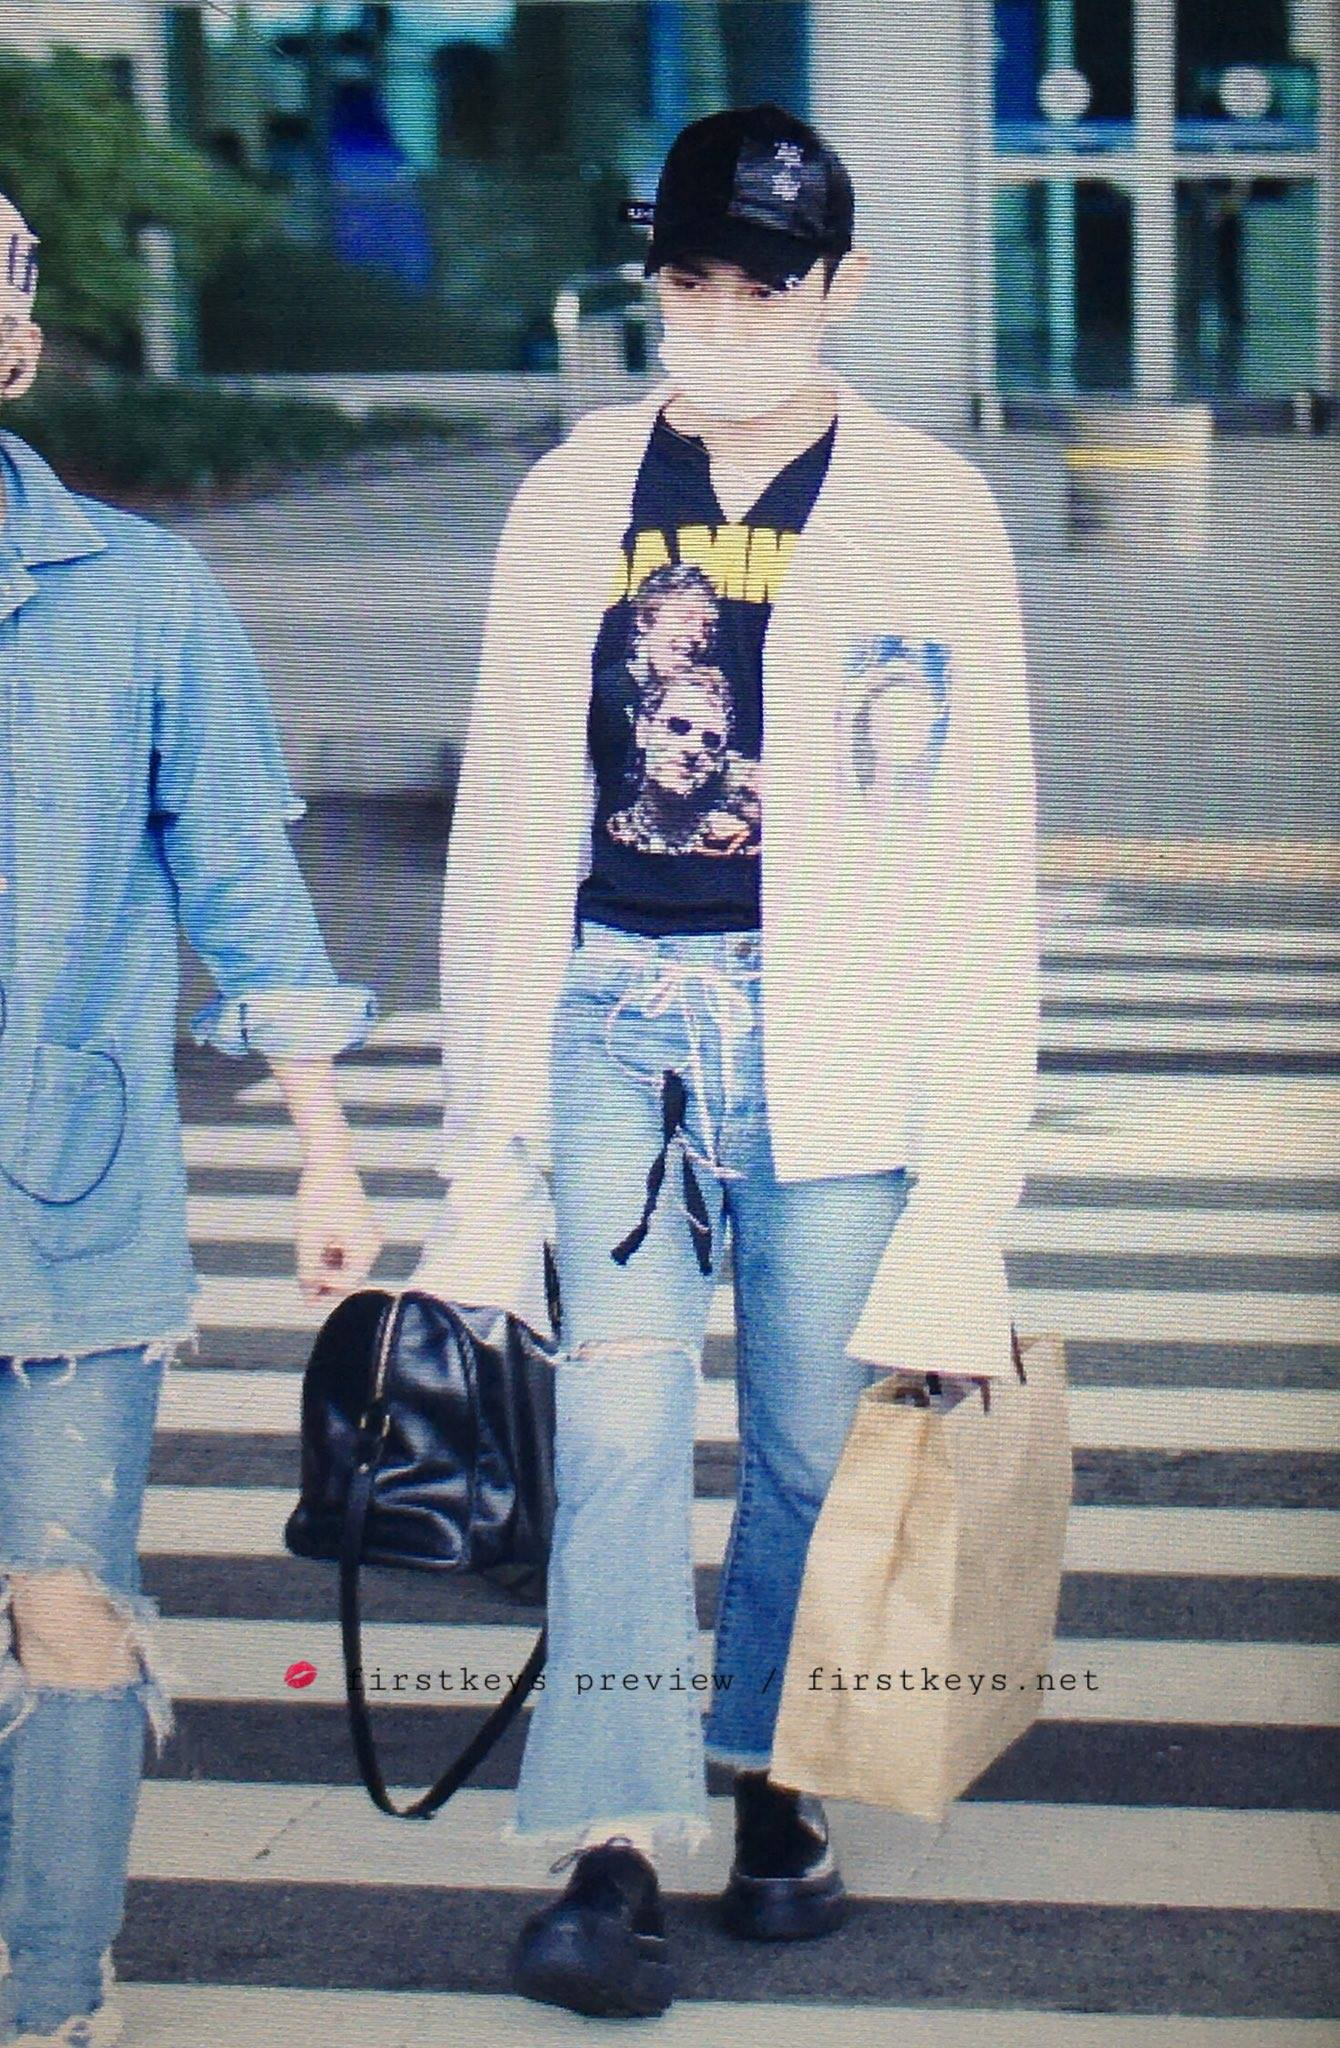 [IMG/160718] Onew, Jonghyun, Key, Minho @Aeropuerto de Kansai e Incheon (Jap-Cor) 5g4flgBR